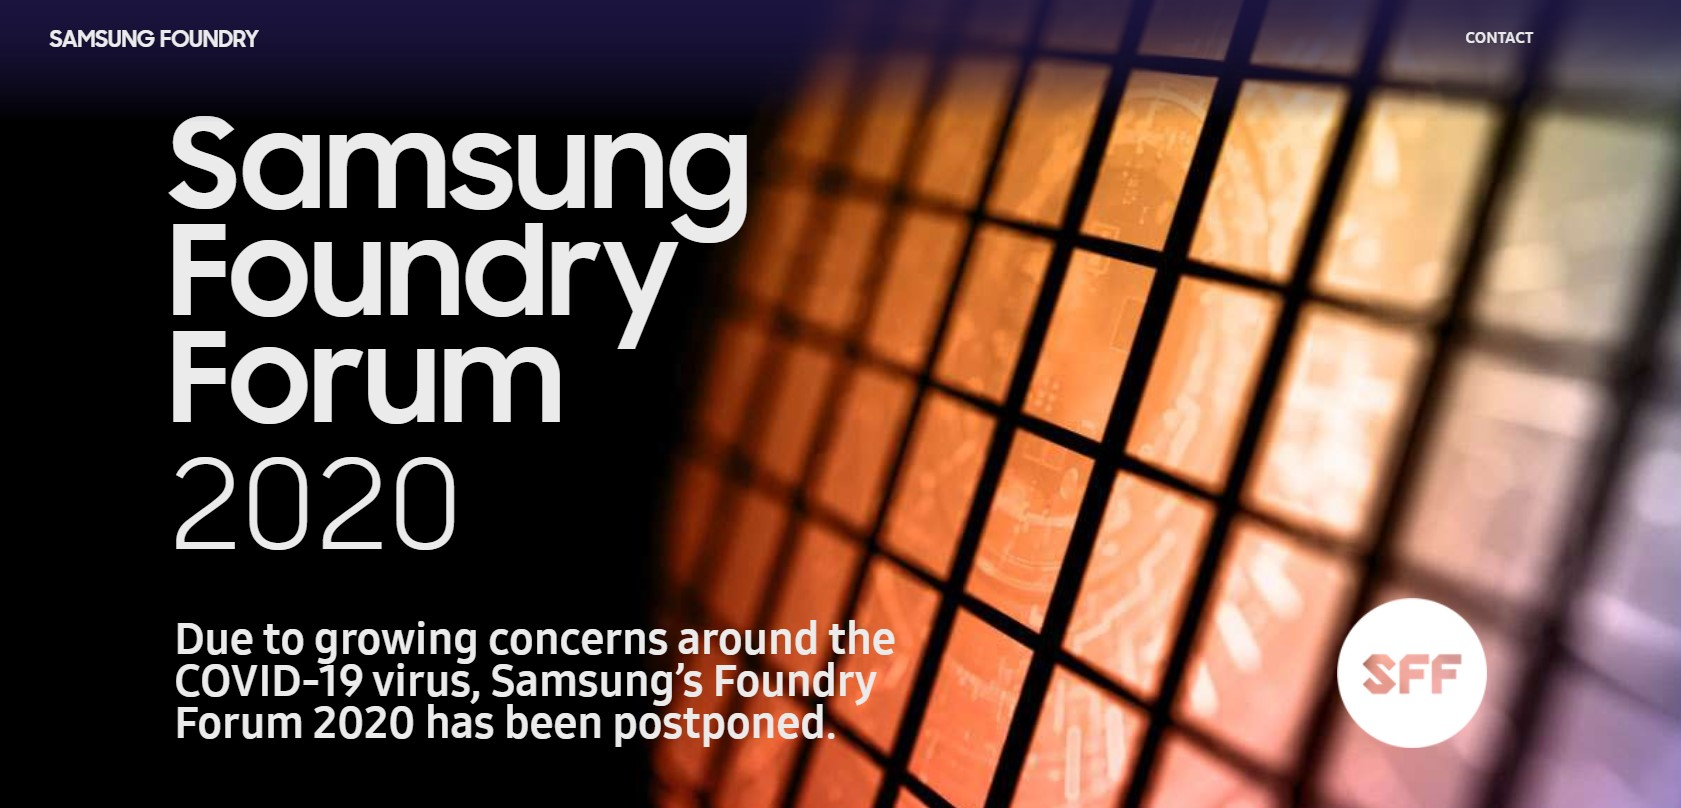 Samsung Foundry Forum 2020 Delayed